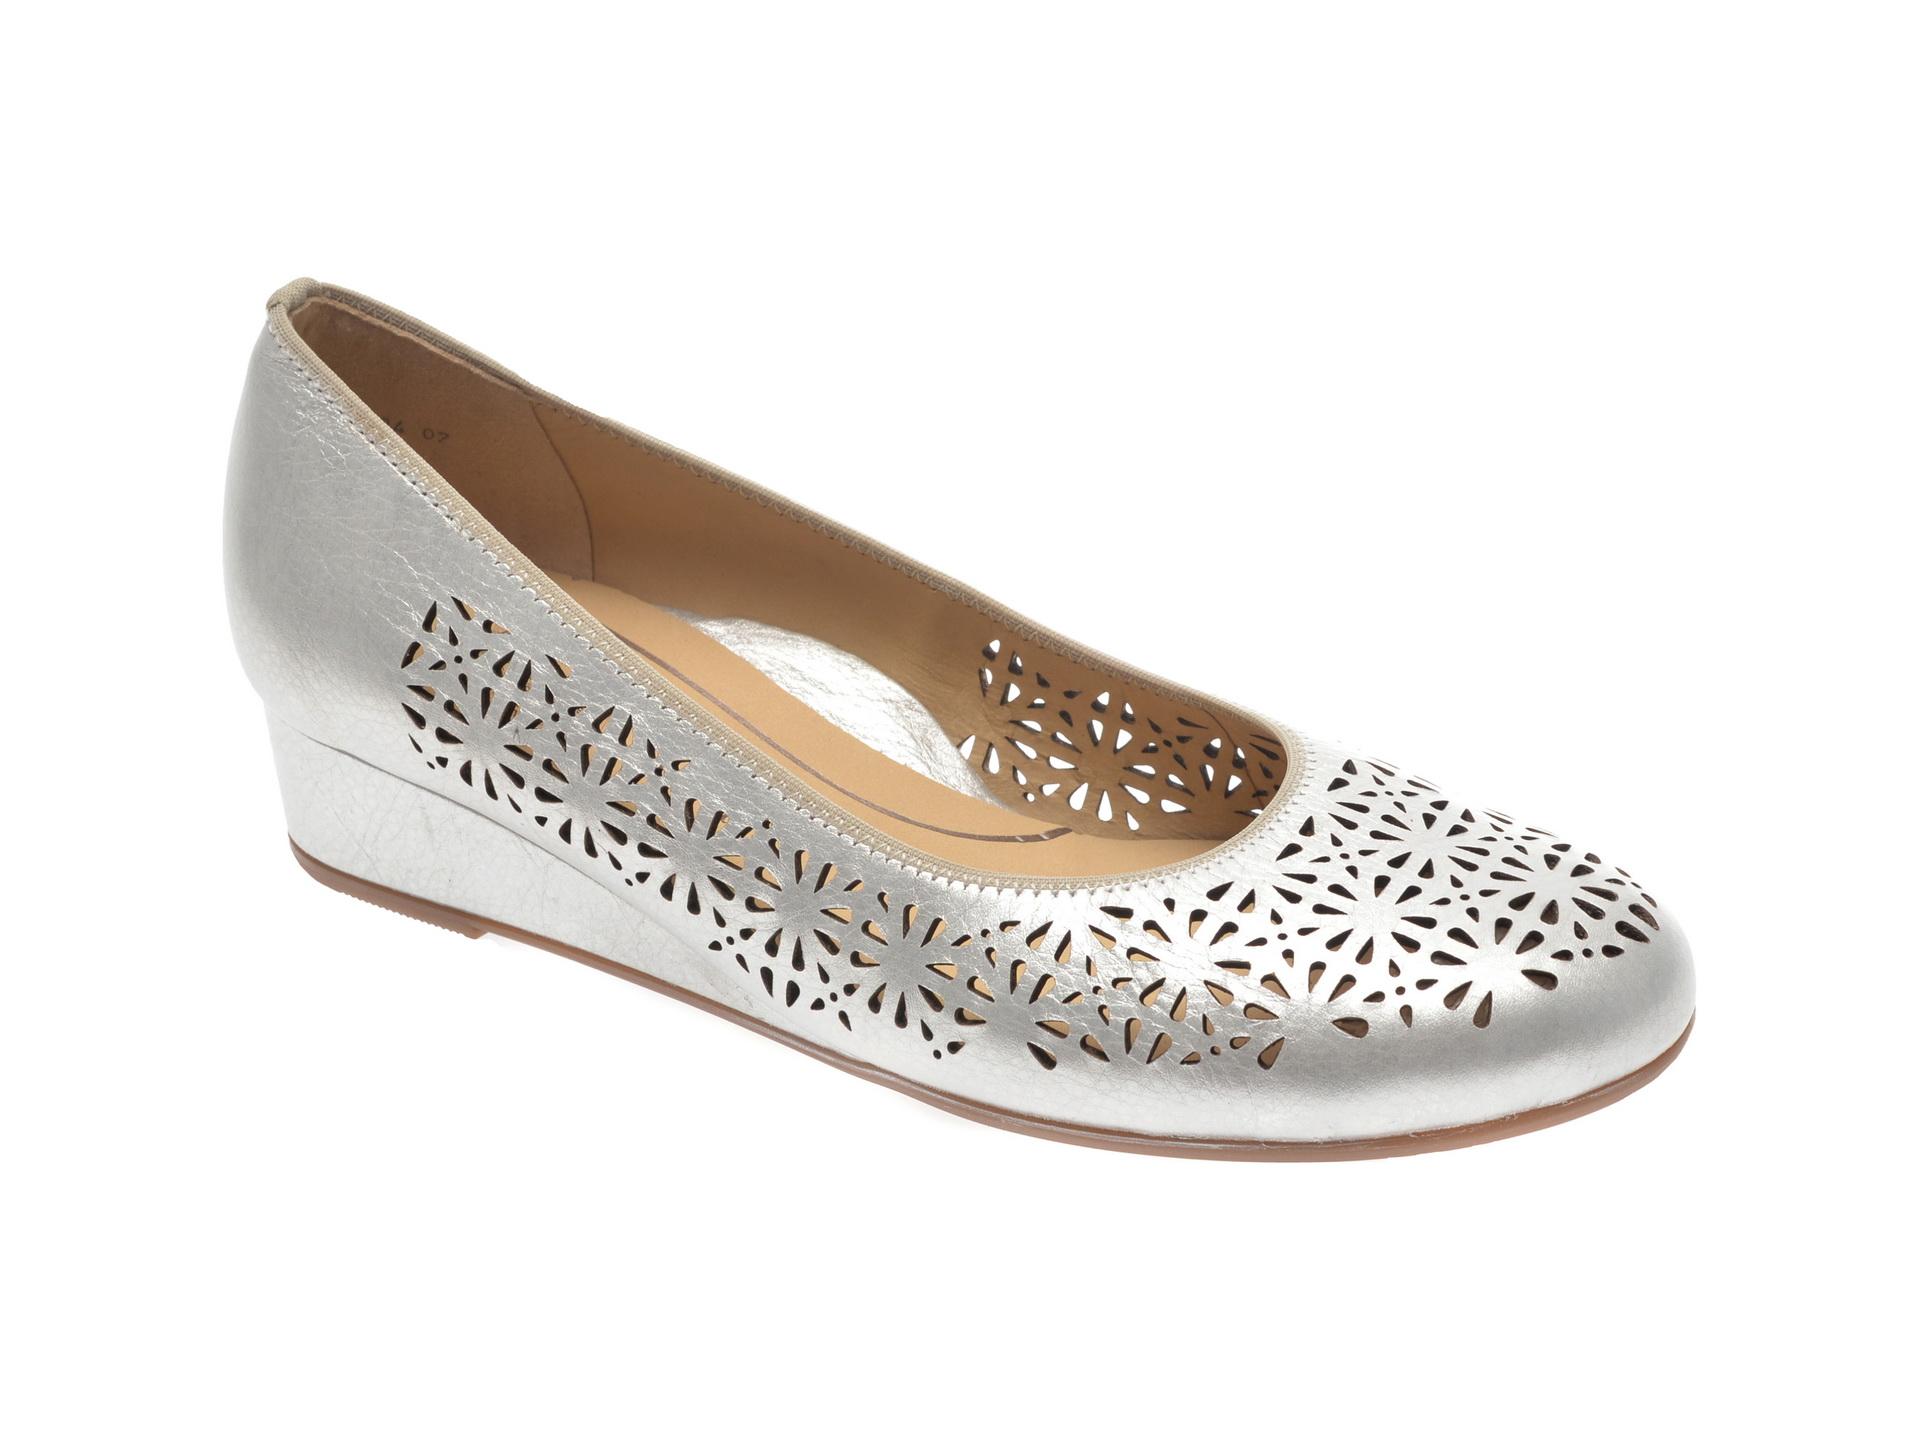 Pantofi ARA argintii, 14334, din piele naturala